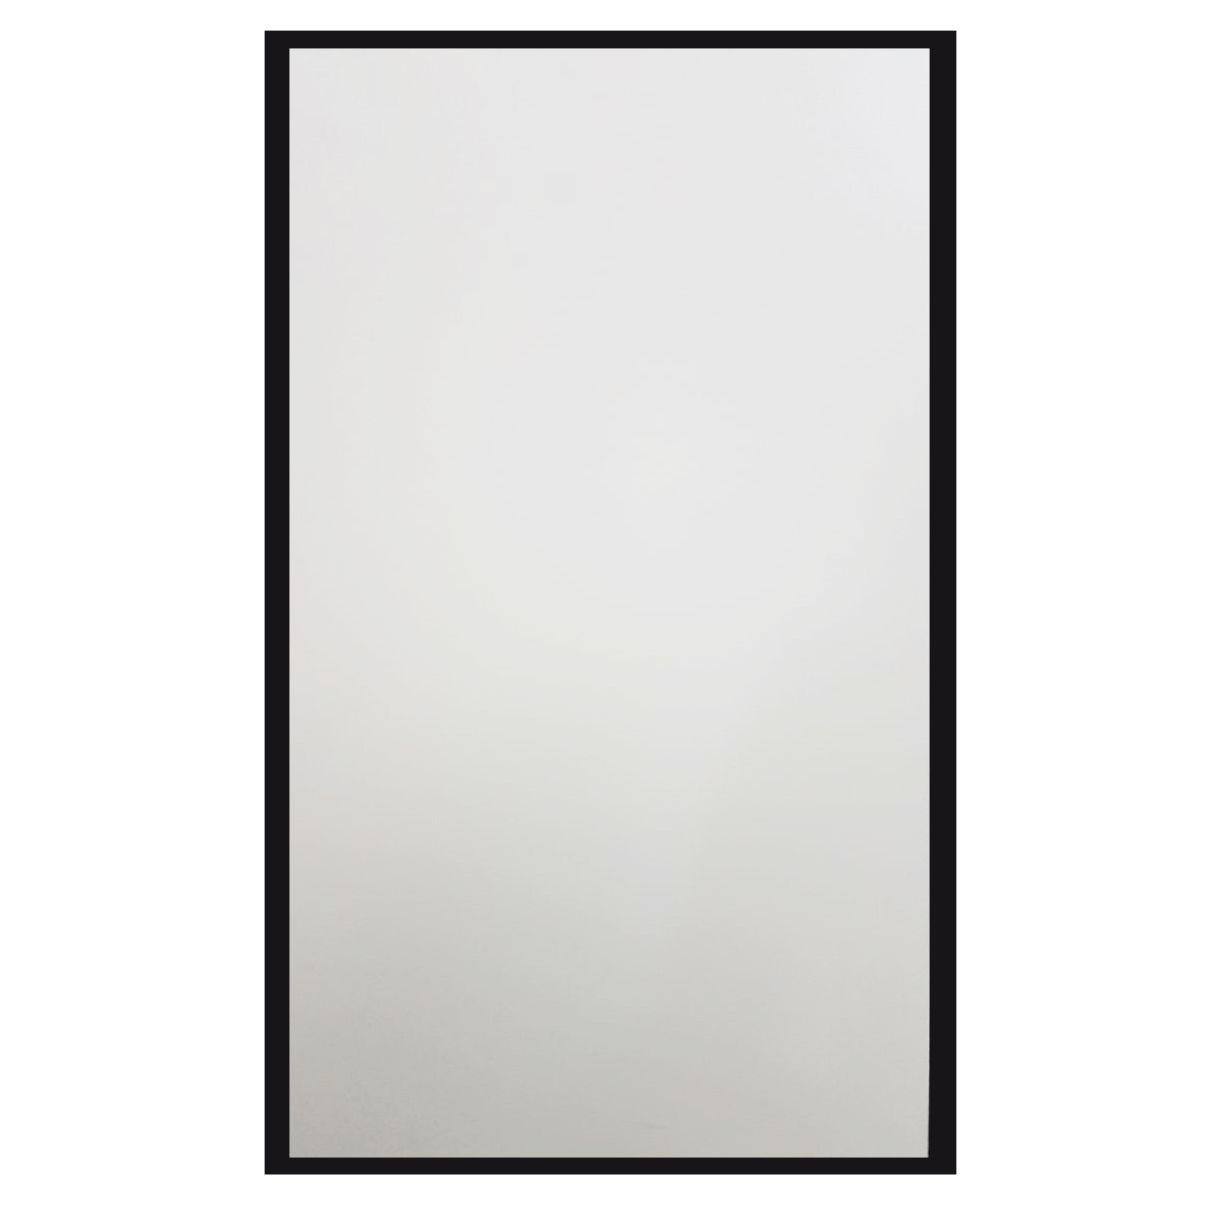 Kit Prancha Deck e  Lona Esteira Ergométrica Polimet Ep 3800